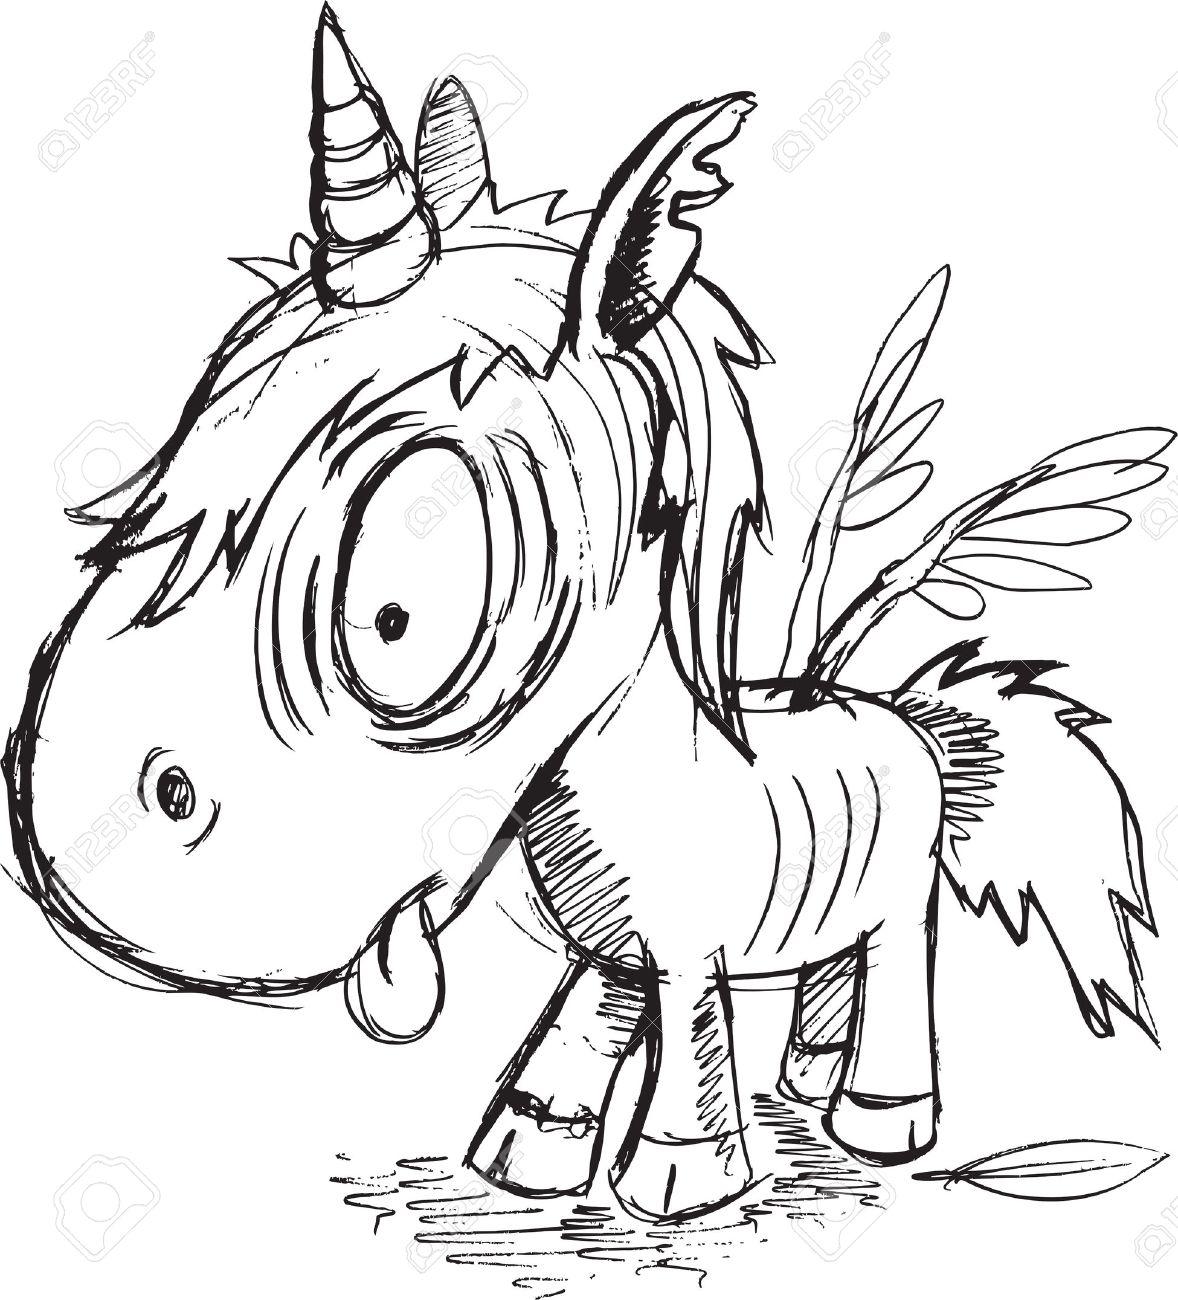 Zombie Unicorn Sketch Vector Illustration Art - 32357512